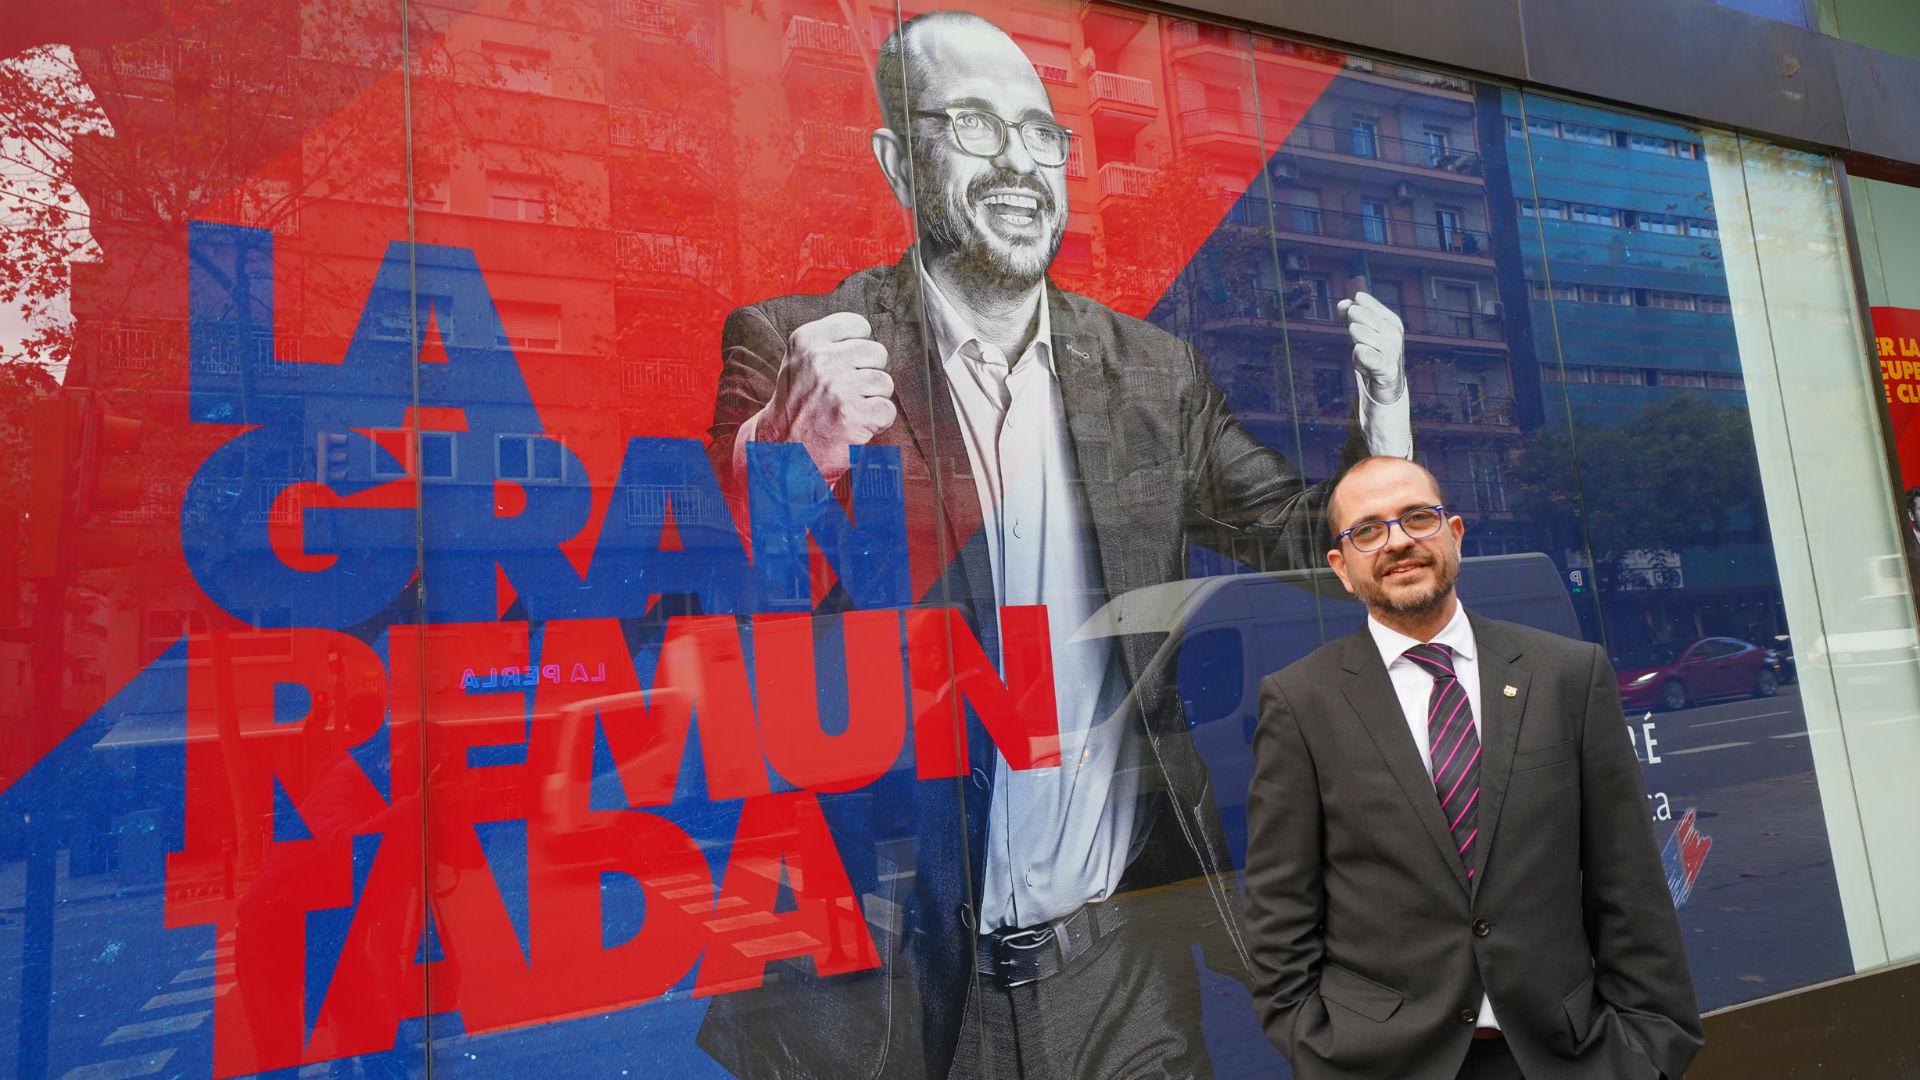 Jordi Farré proposa carnet gratis 25 anys